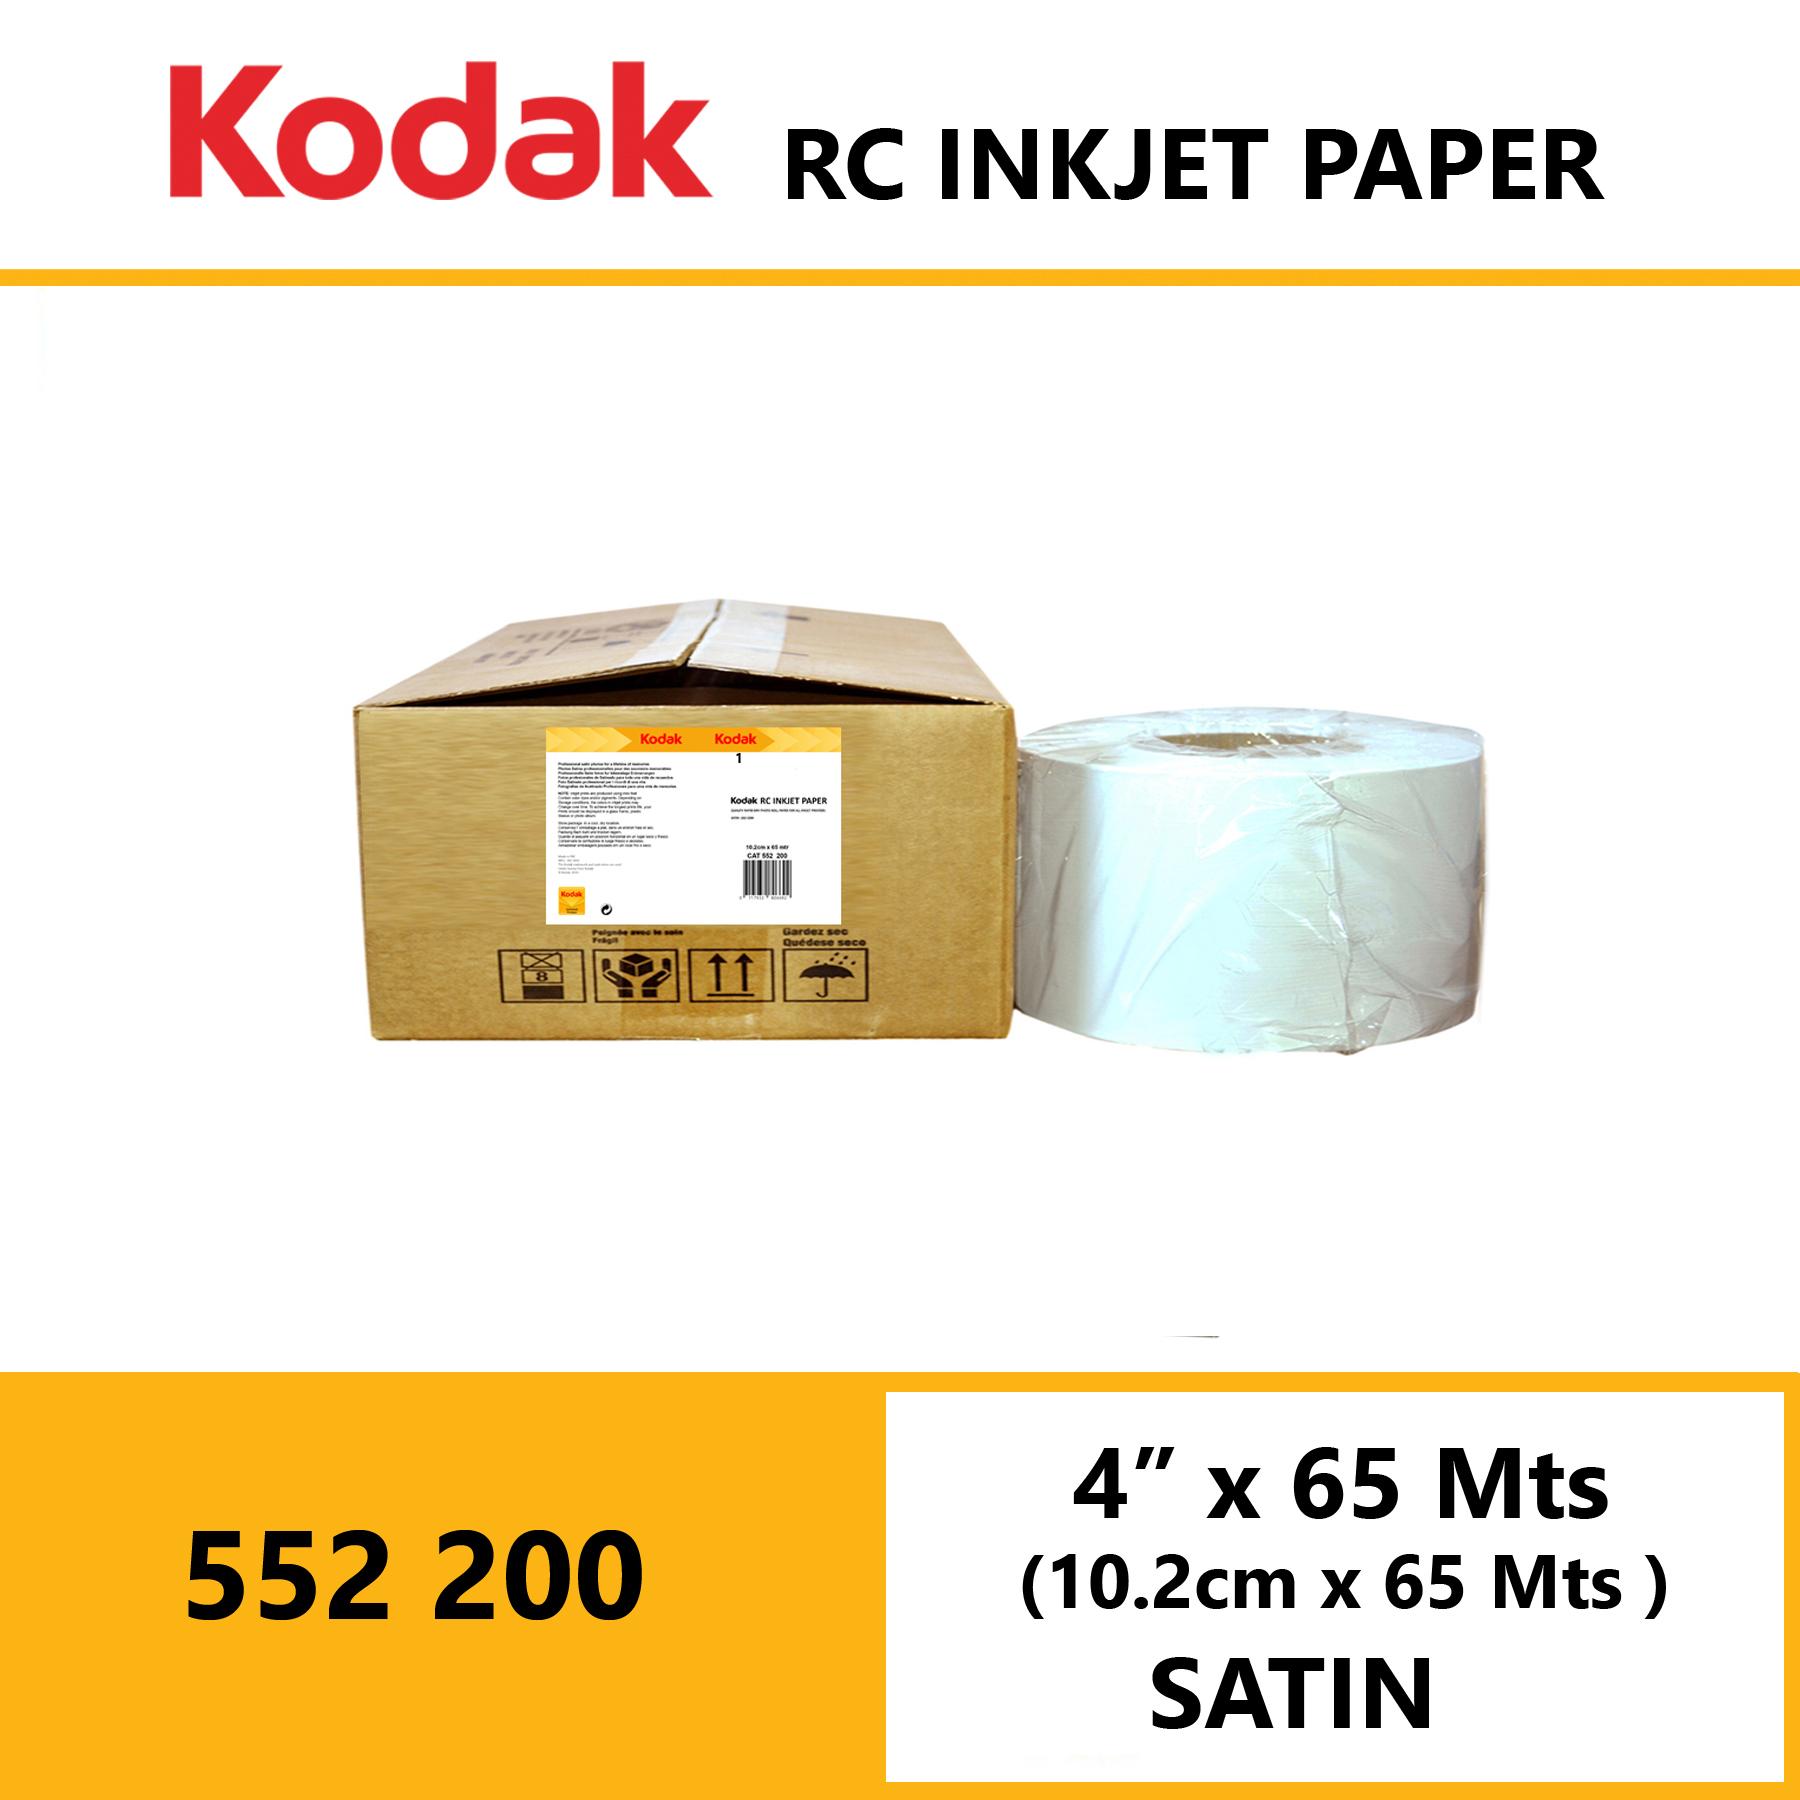 "Kodak Inkjet RC Paper 4 "" x 65 Mtrs Satin"